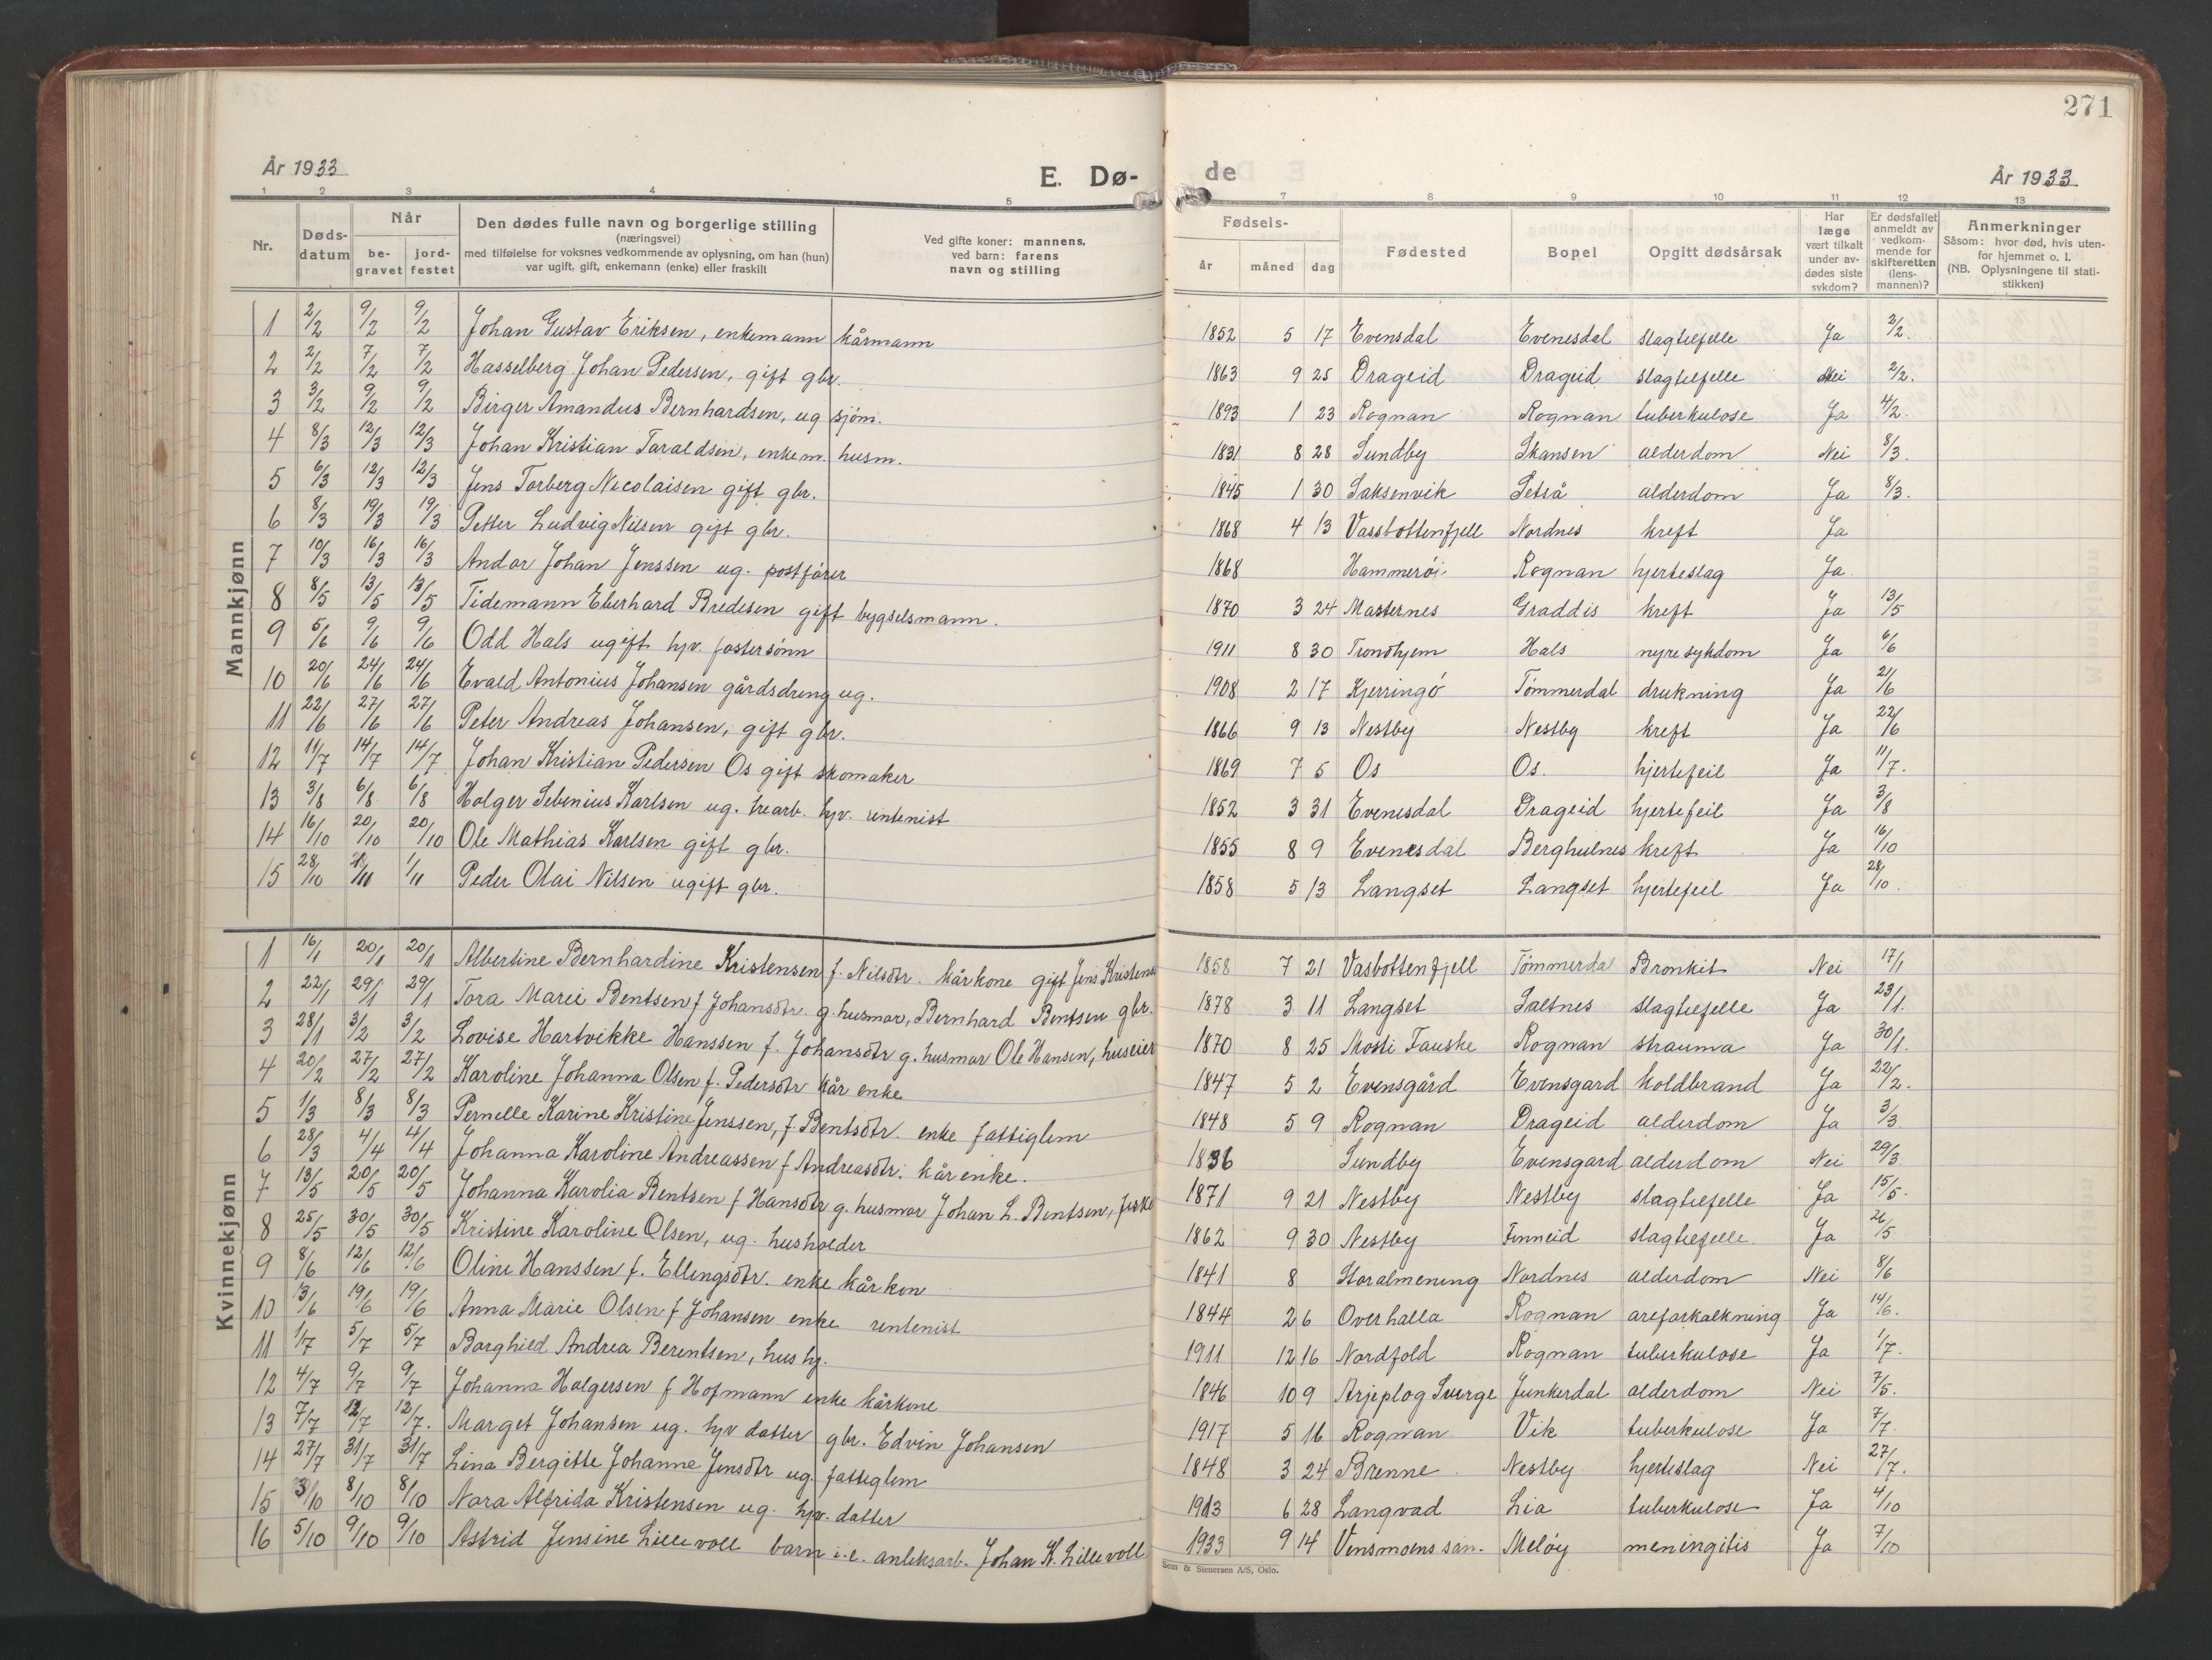 SAT, Ministerialprotokoller, klokkerbøker og fødselsregistre - Nordland, 847/L0680: Klokkerbok nr. 847C08, 1930-1947, s. 271